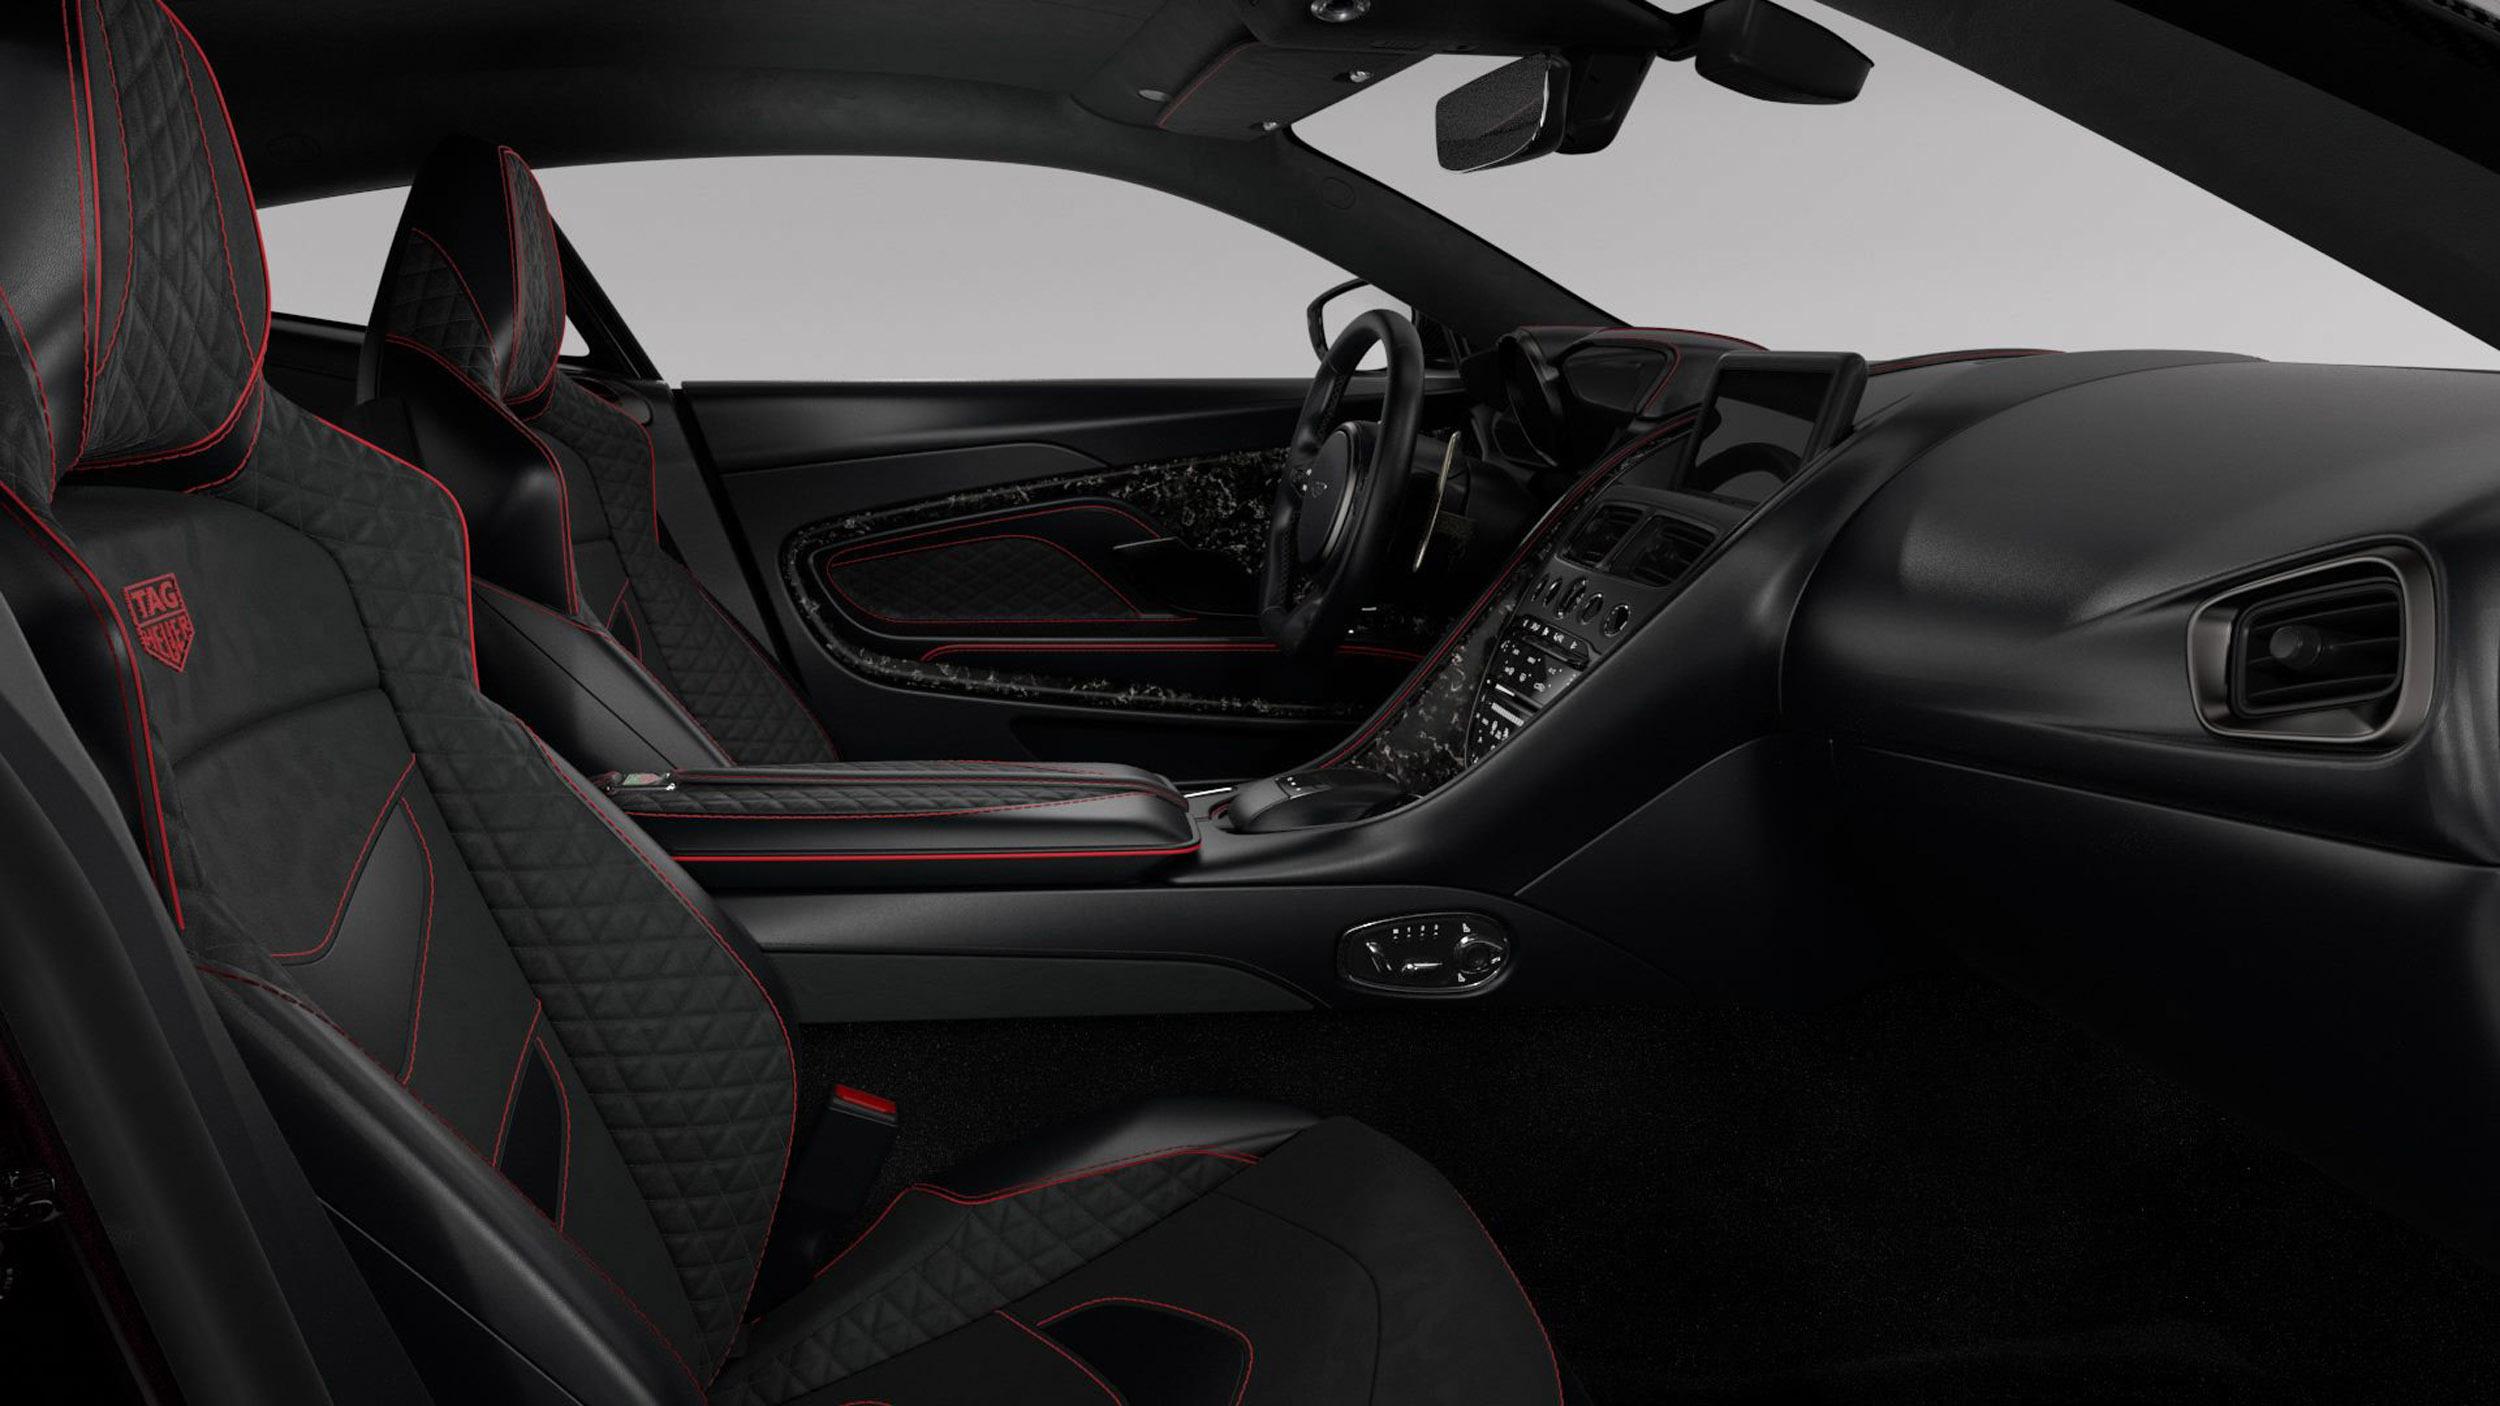 Aston Martin DBS Superleggera Tag Heuer Edition (5)